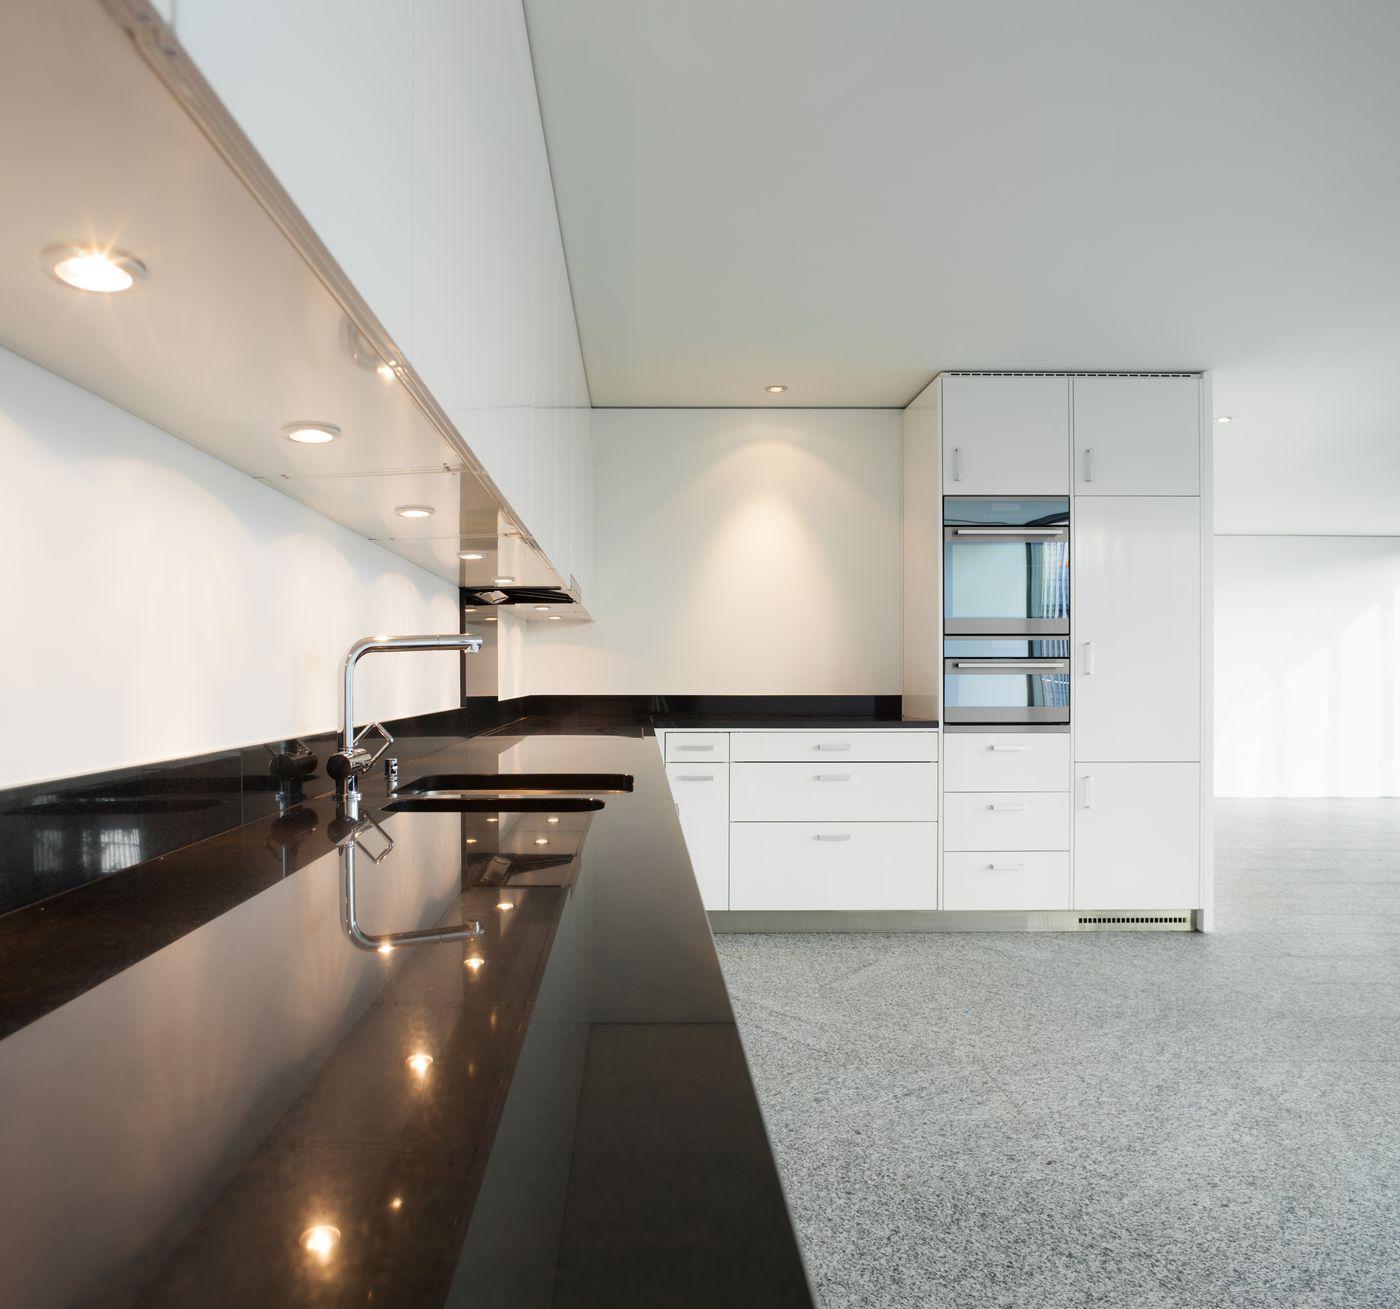 eclairage dessus evier cuisine maison design. Black Bedroom Furniture Sets. Home Design Ideas